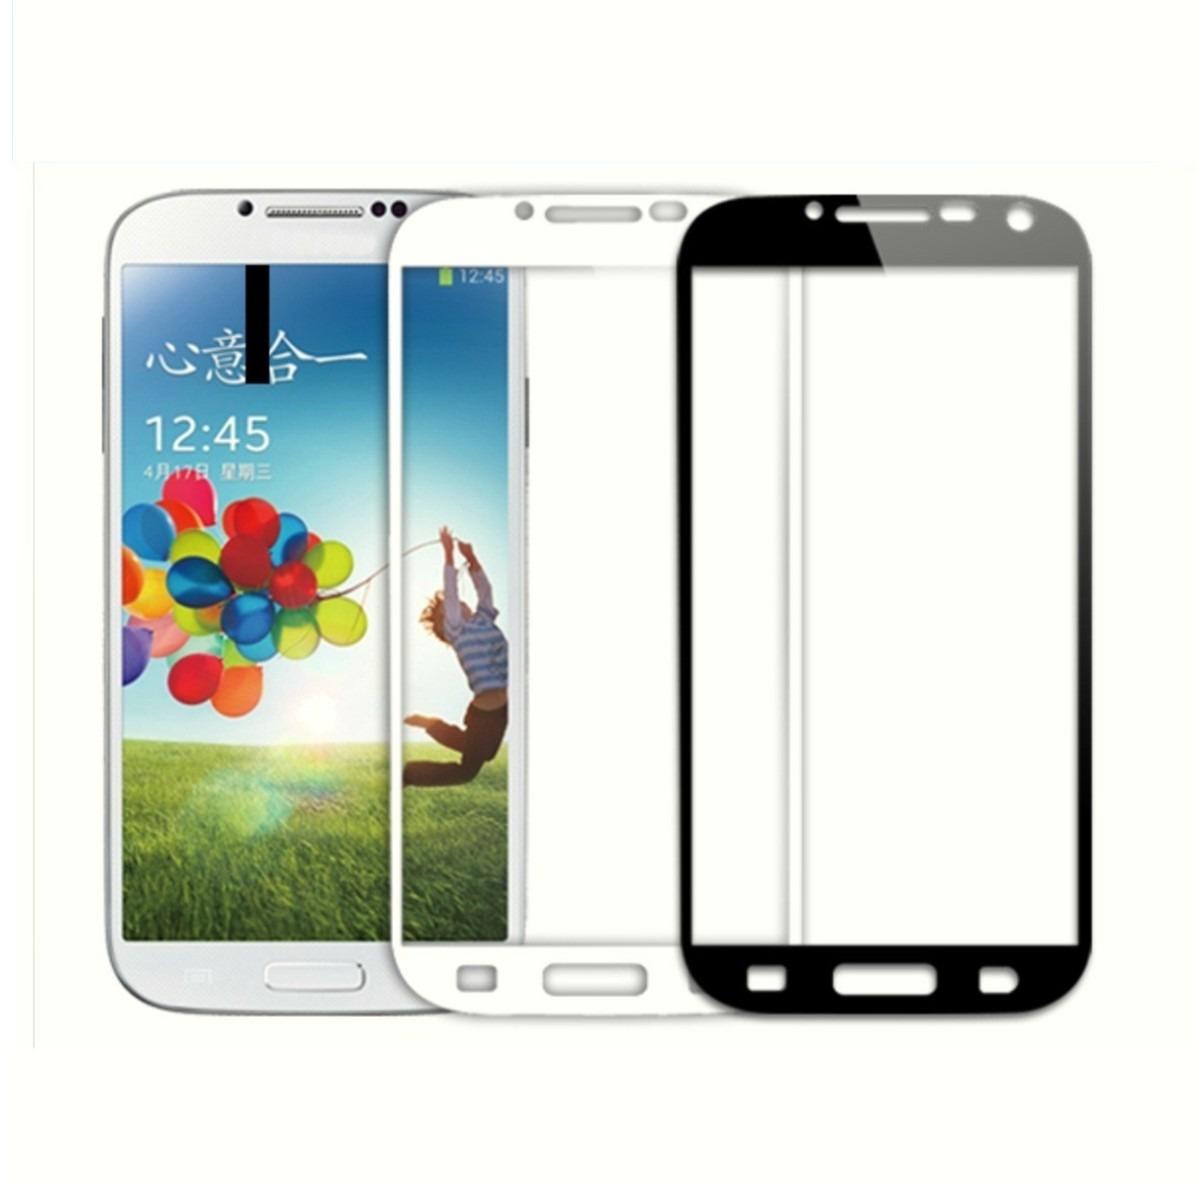 Galaxy S4 ativo cracking tela